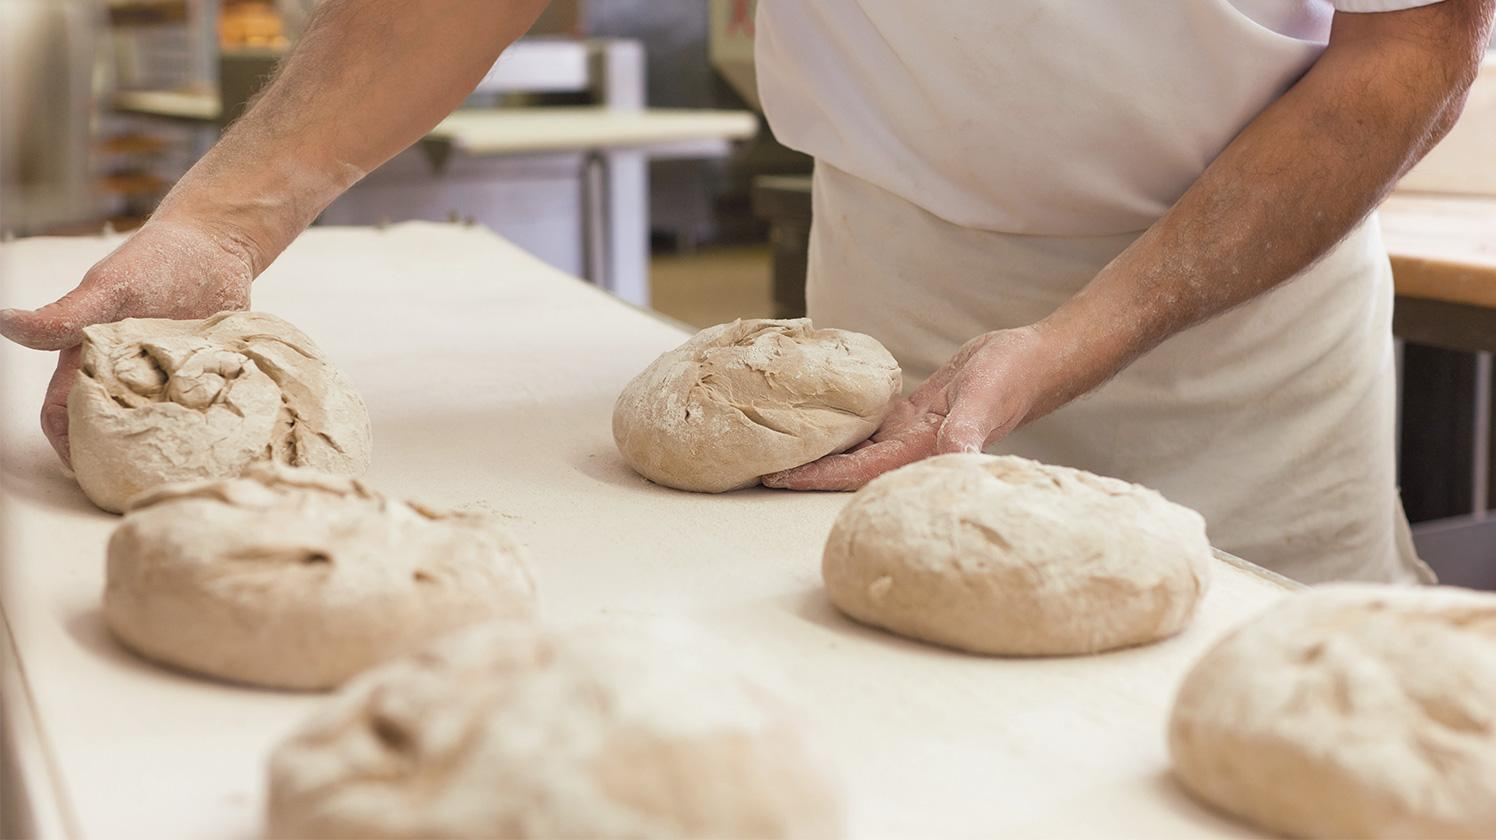 BRITA filter PURITY Steam bakery making bread